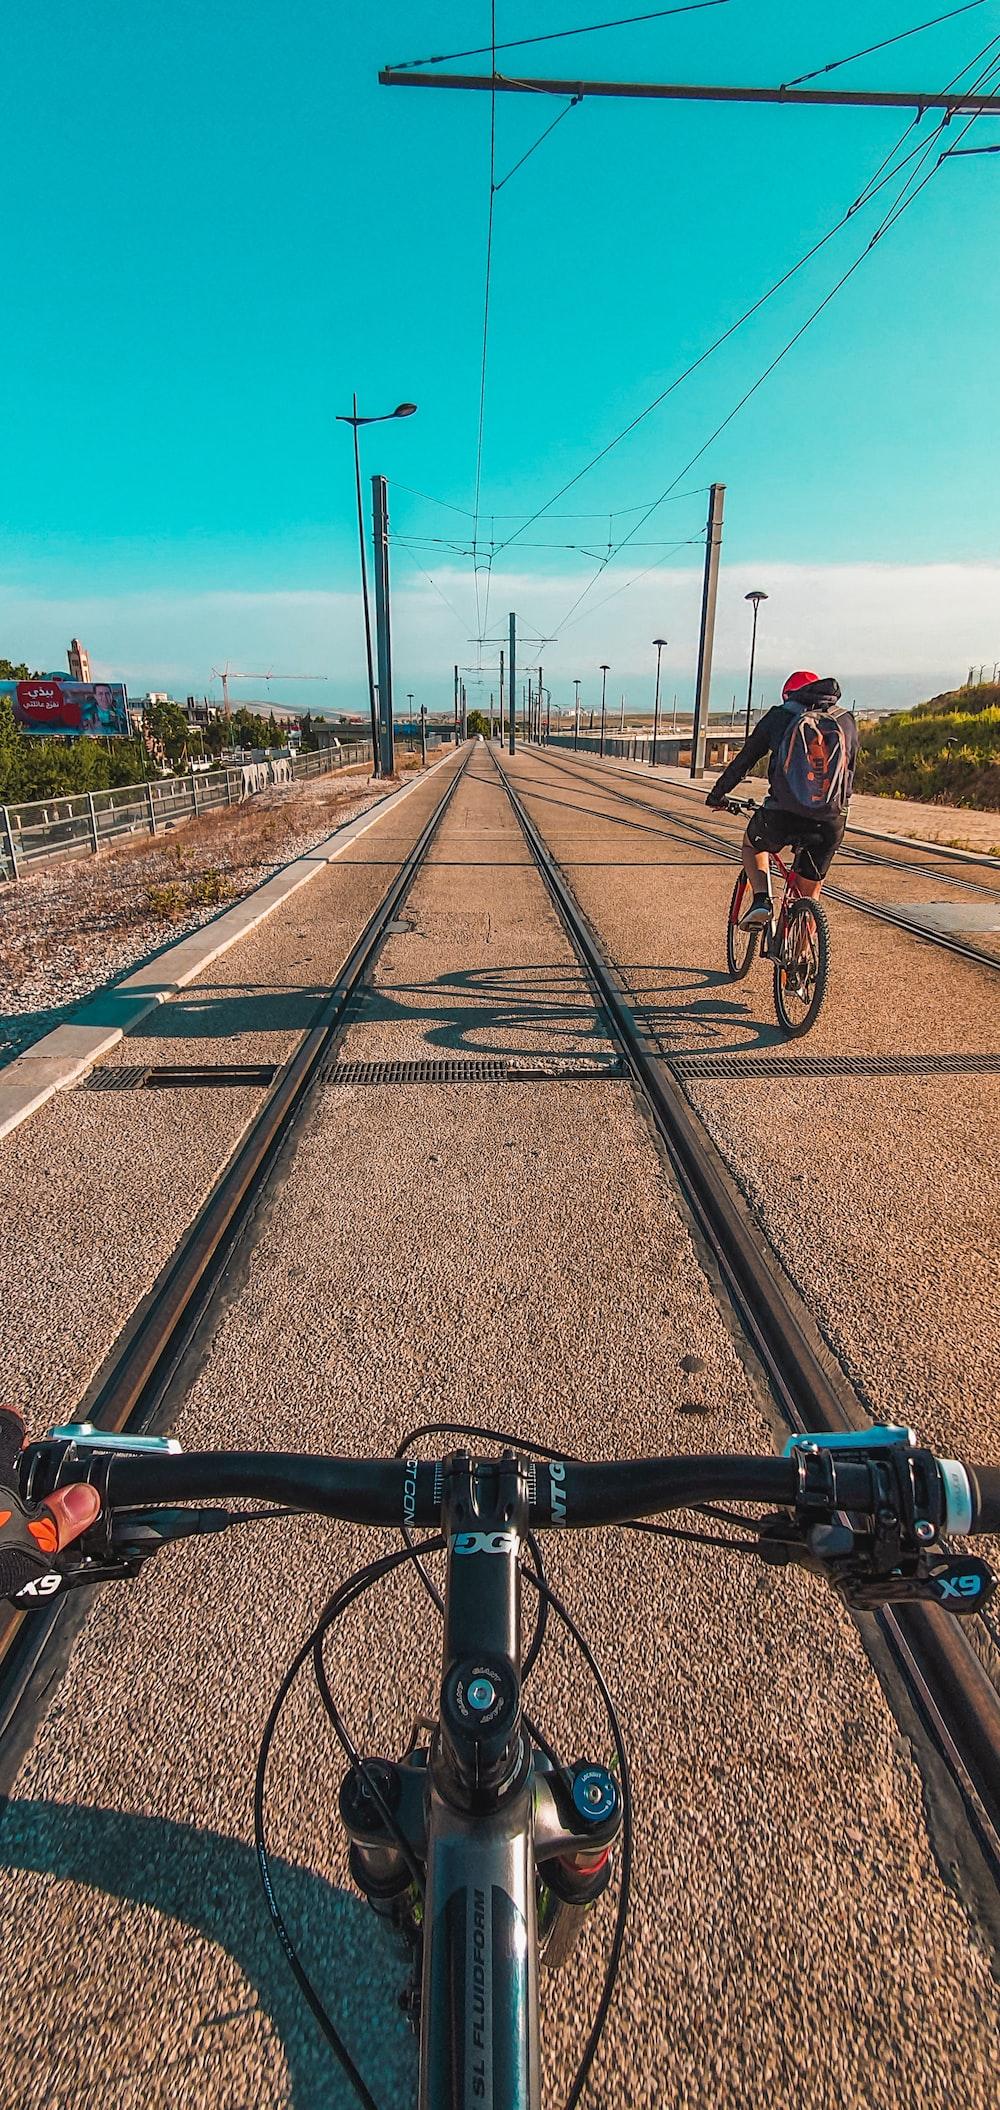 man in black jacket riding bicycle on train rail during daytime